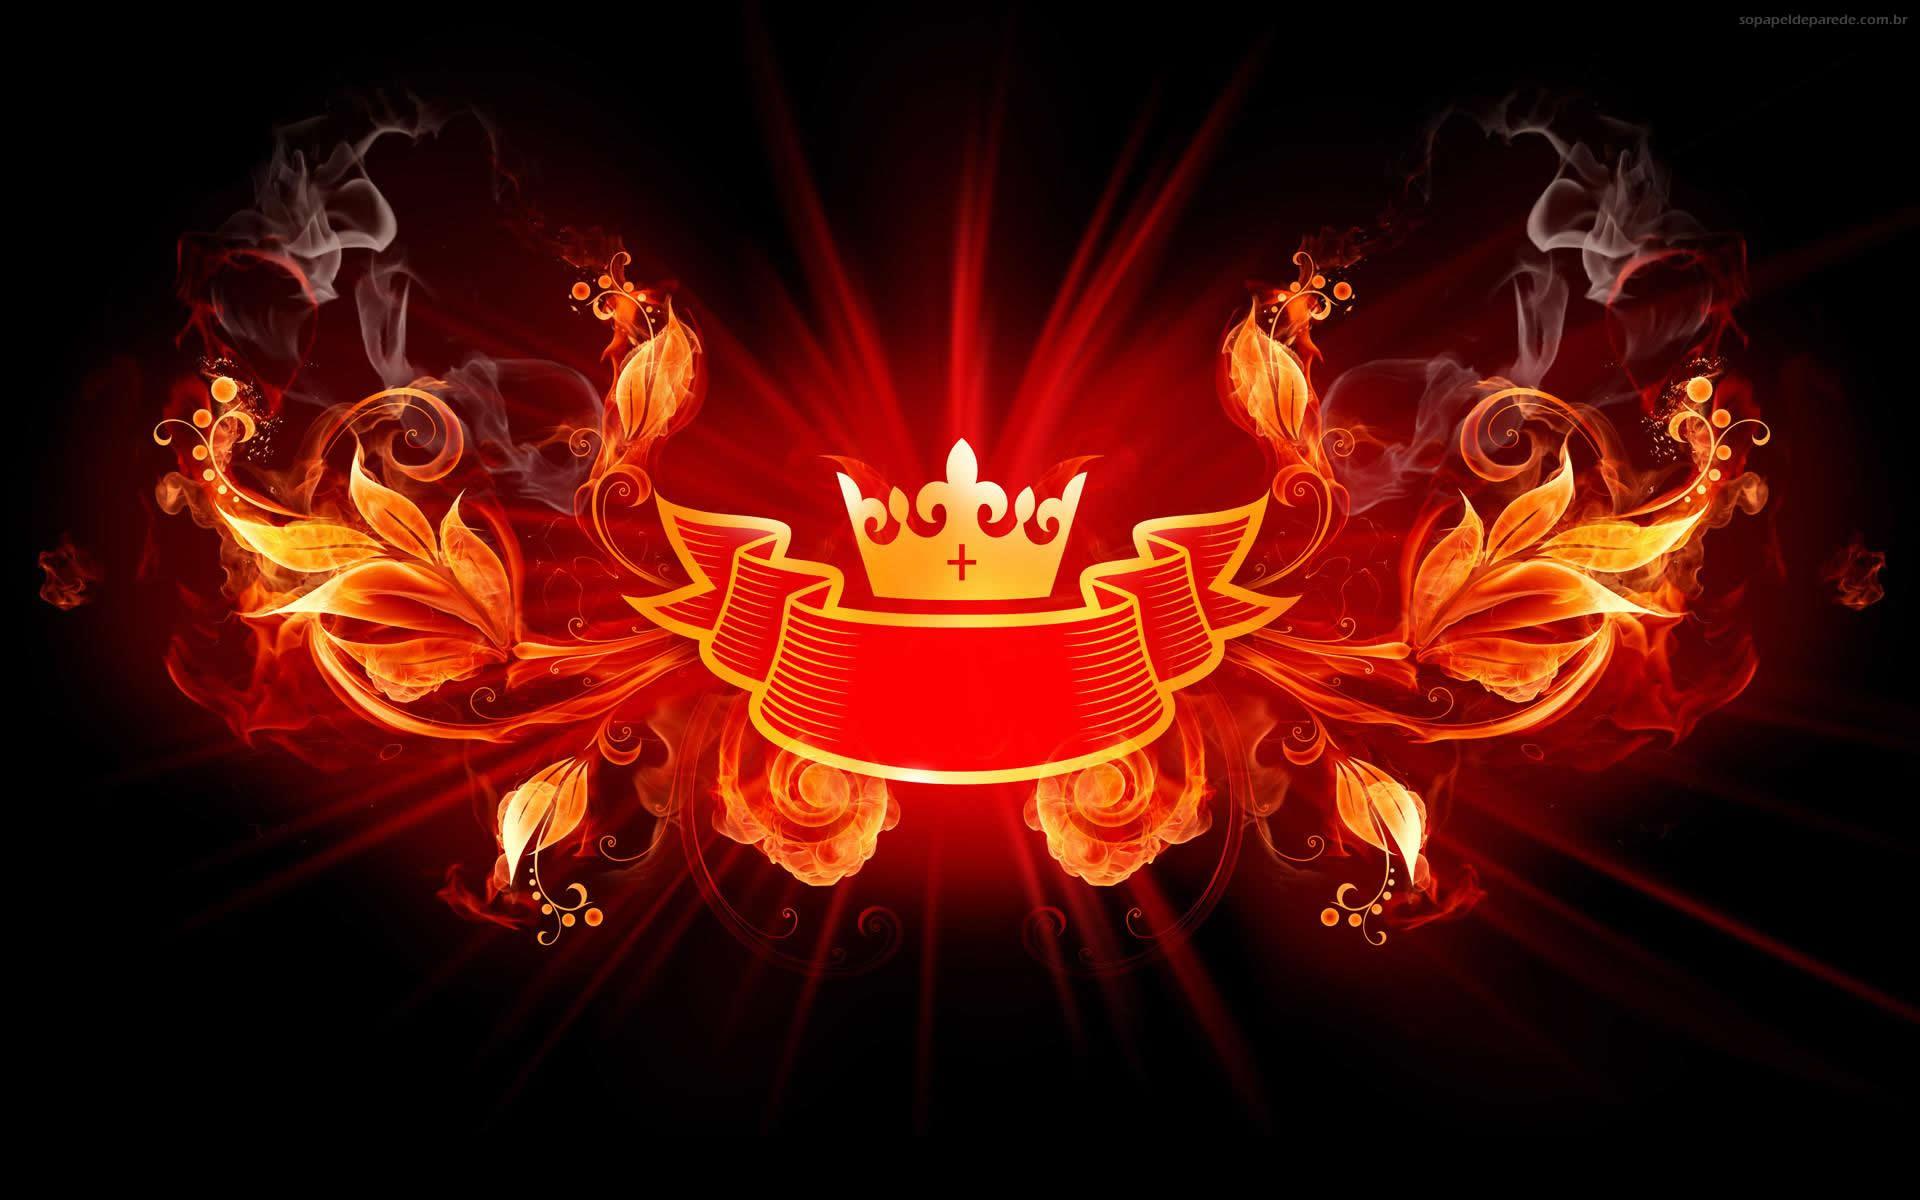 papel-de-parede-fogo-fire-wallpapers-06-king-rei